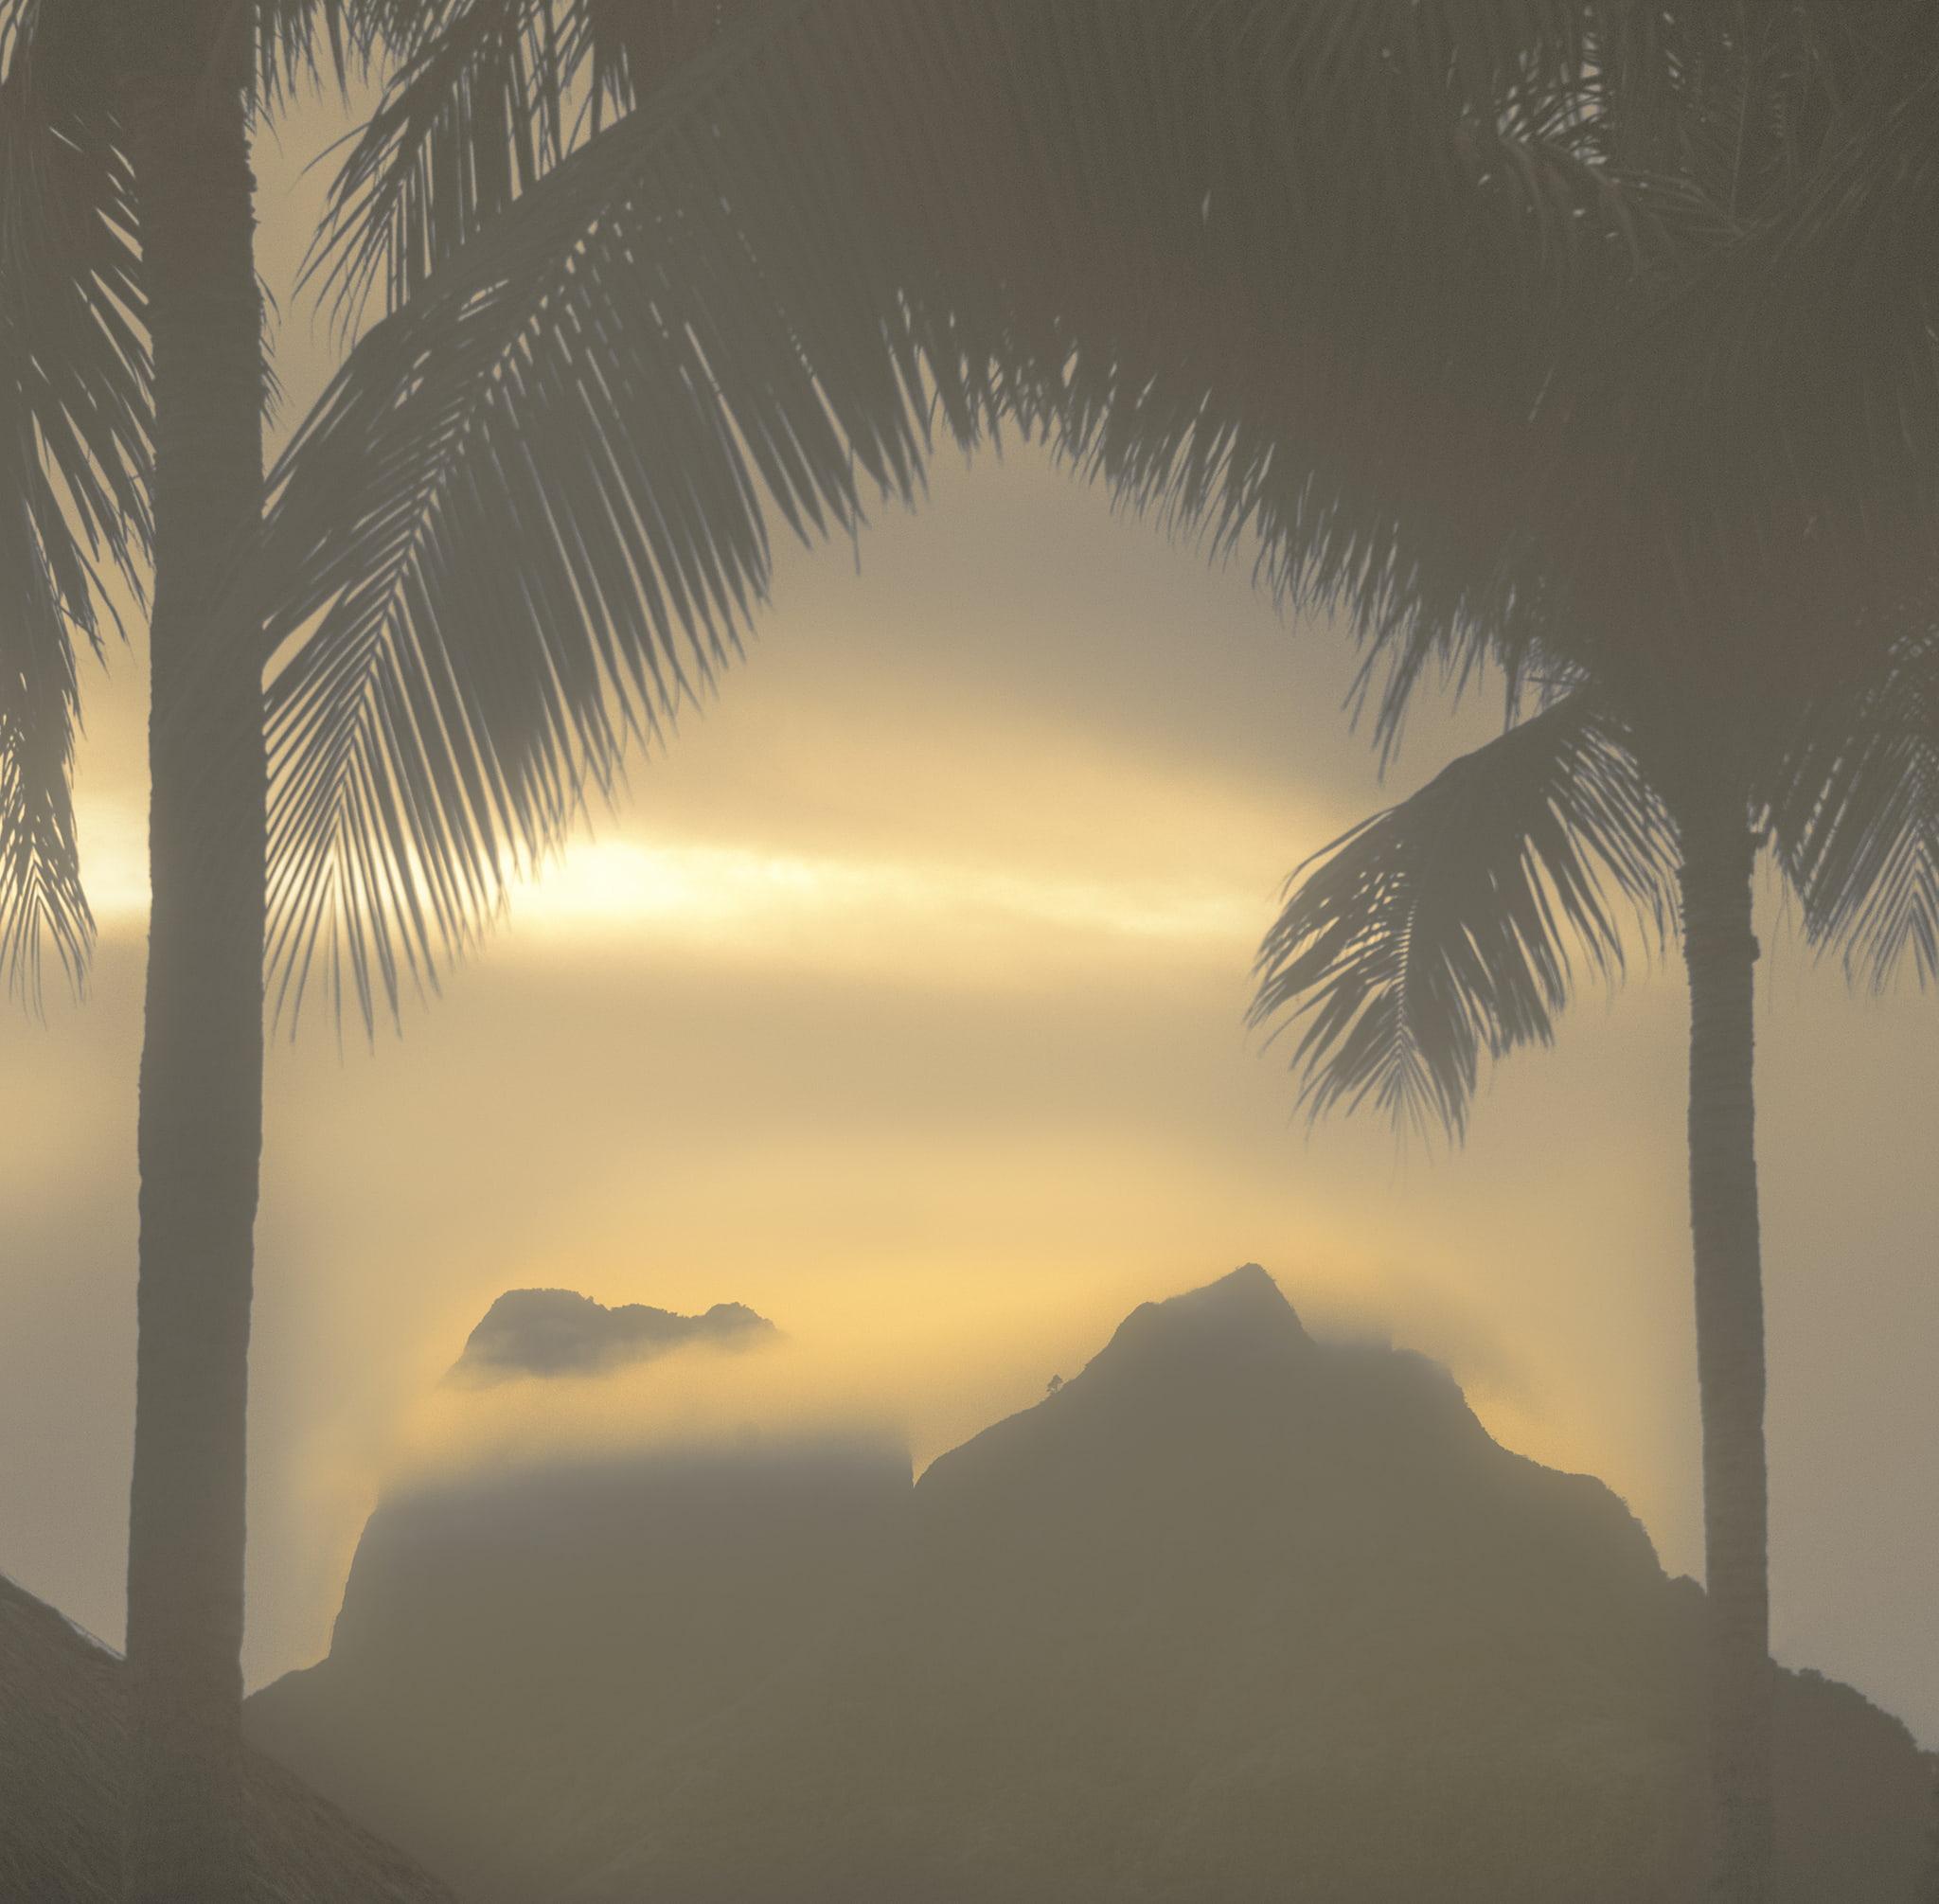 Mount Otemanu Pictures - Bora Bora - Franklin Arts